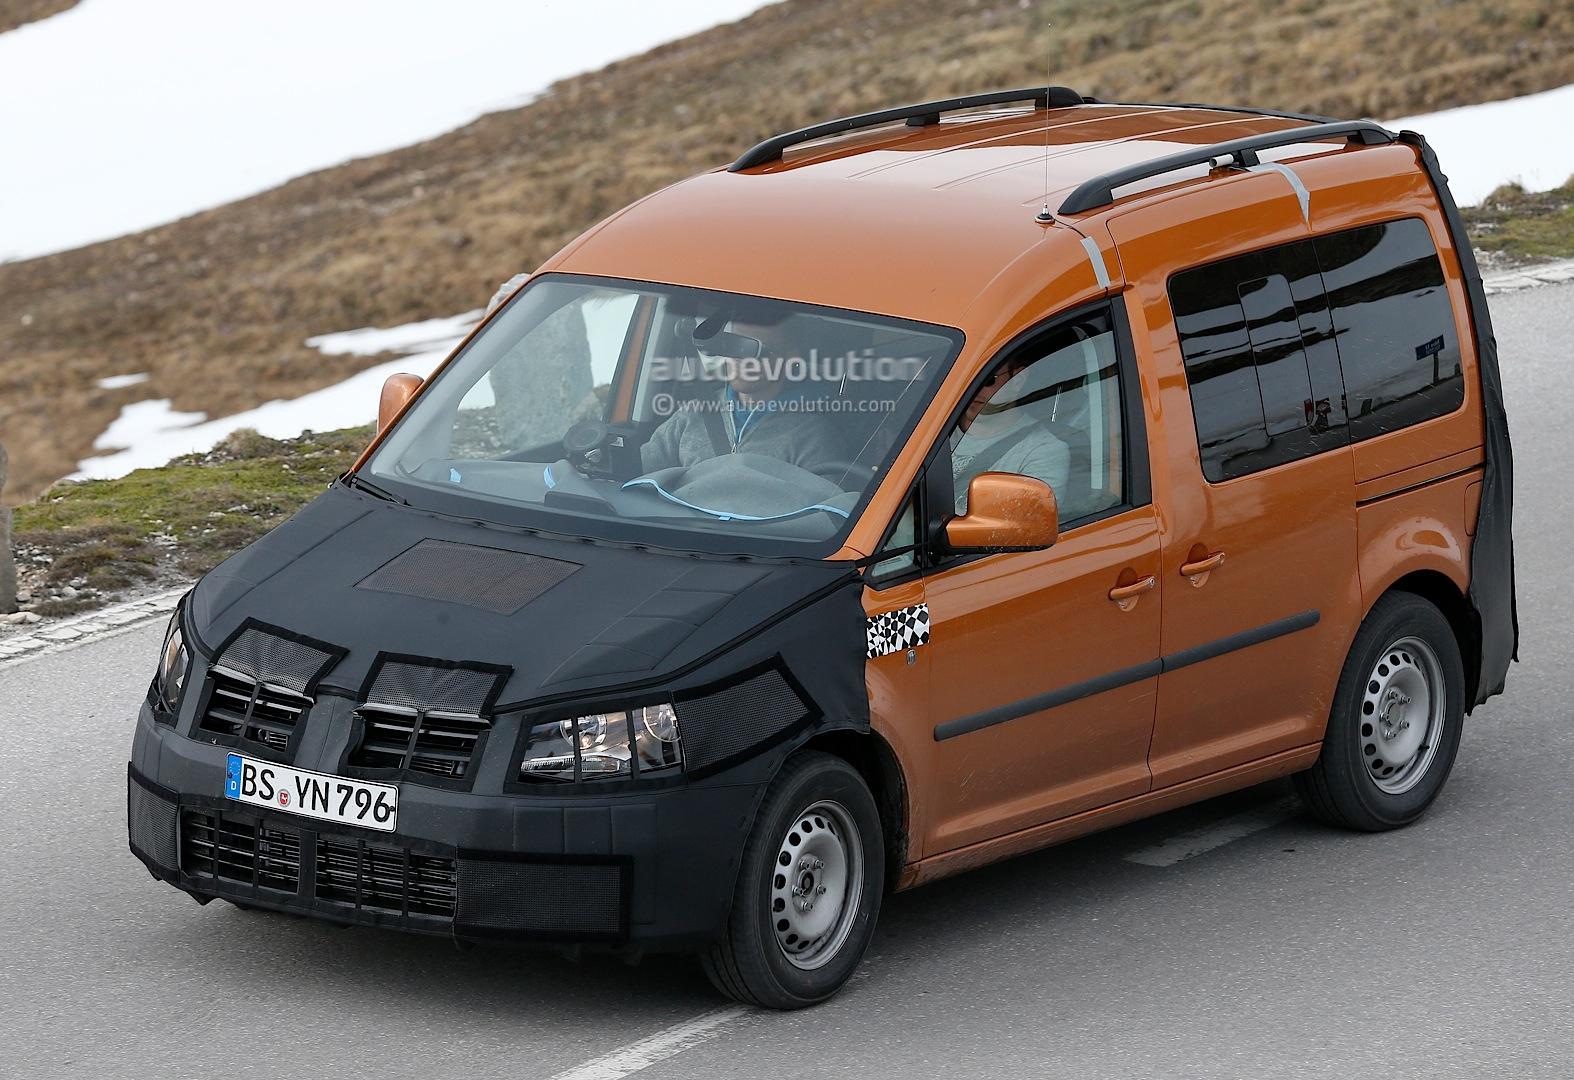 Spyshots New Volkswagen Caddy Interior Revealed